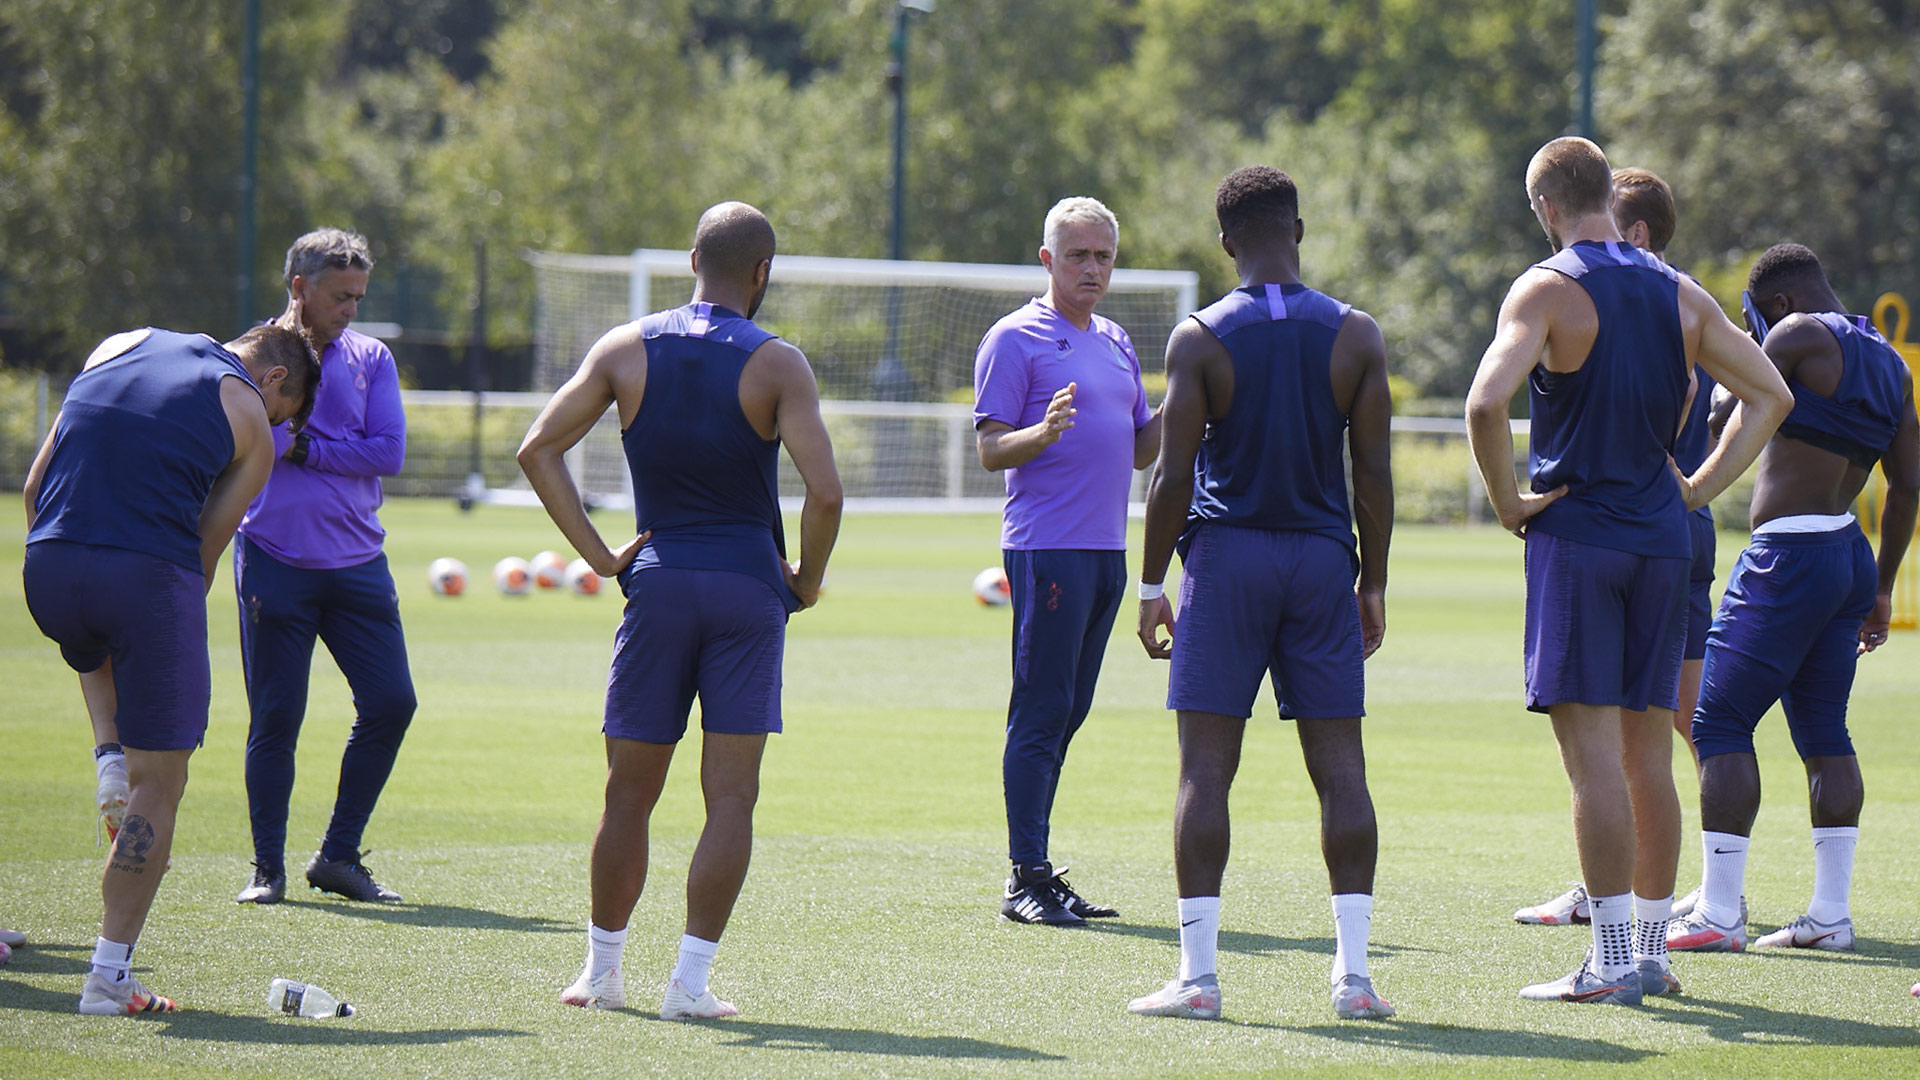 All or Nothing: Tottenham Hotspur - Season 1